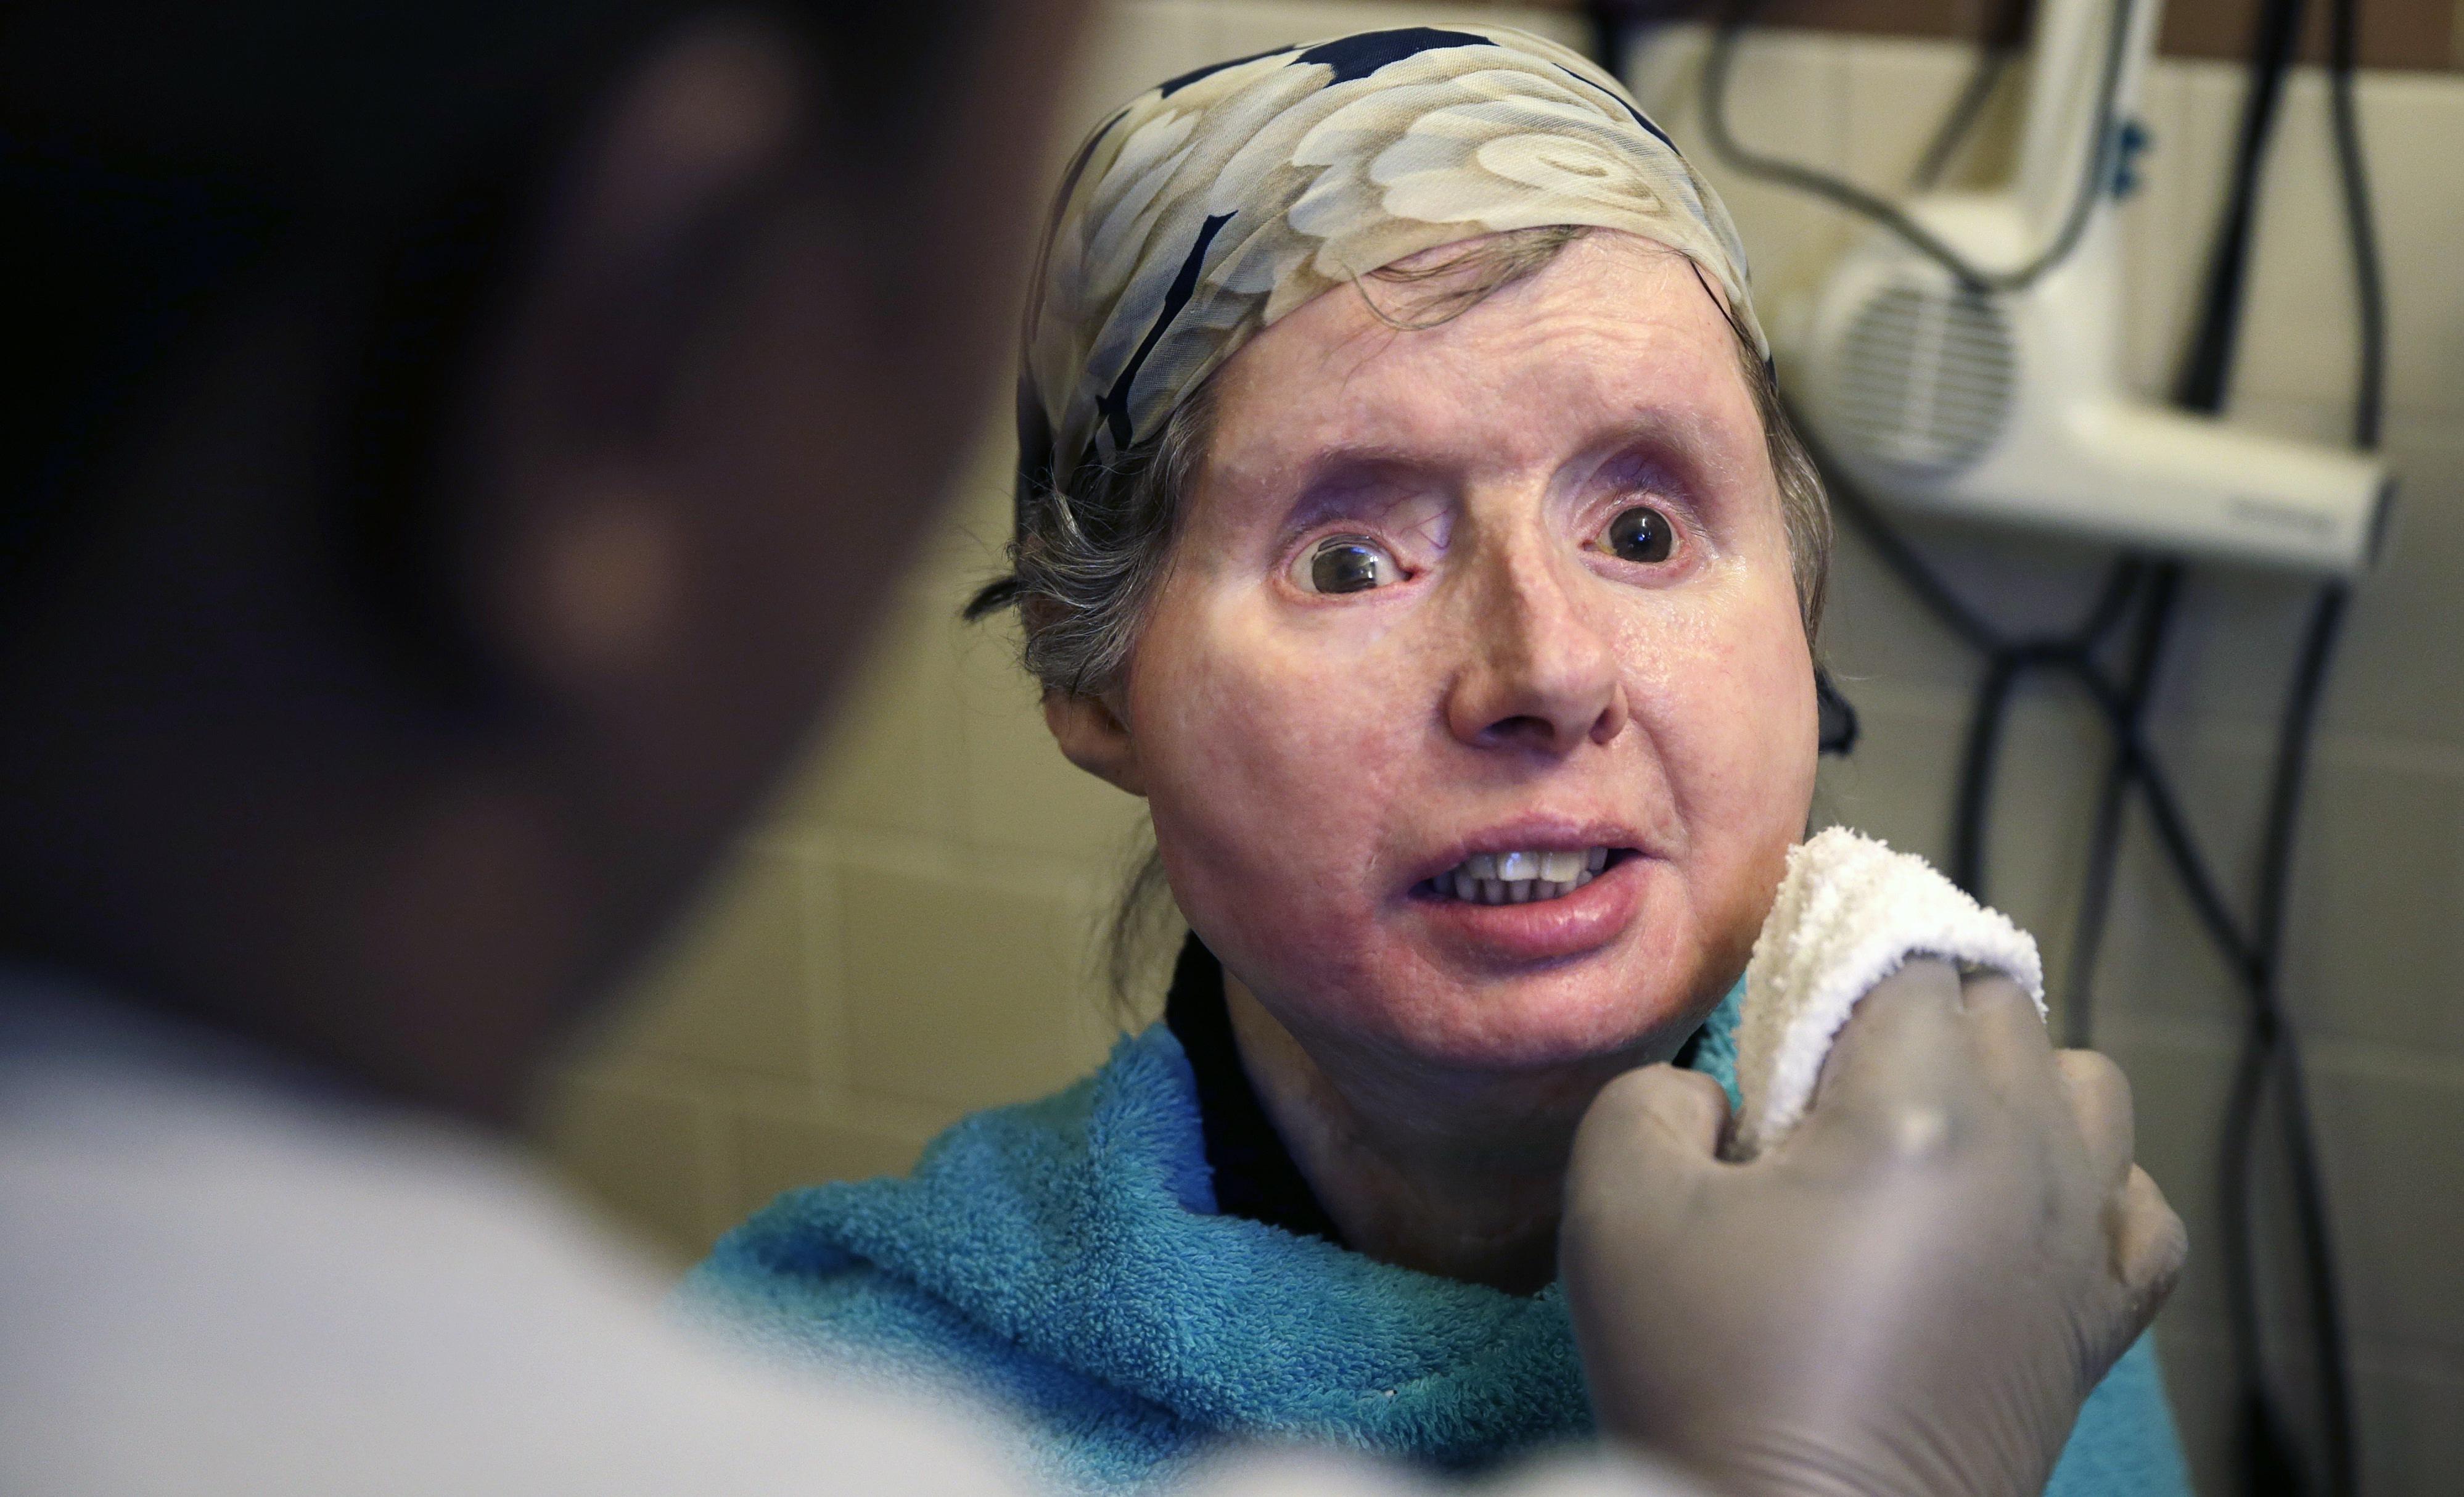 Body Of Chimp Victim Rejecting Face Transplant